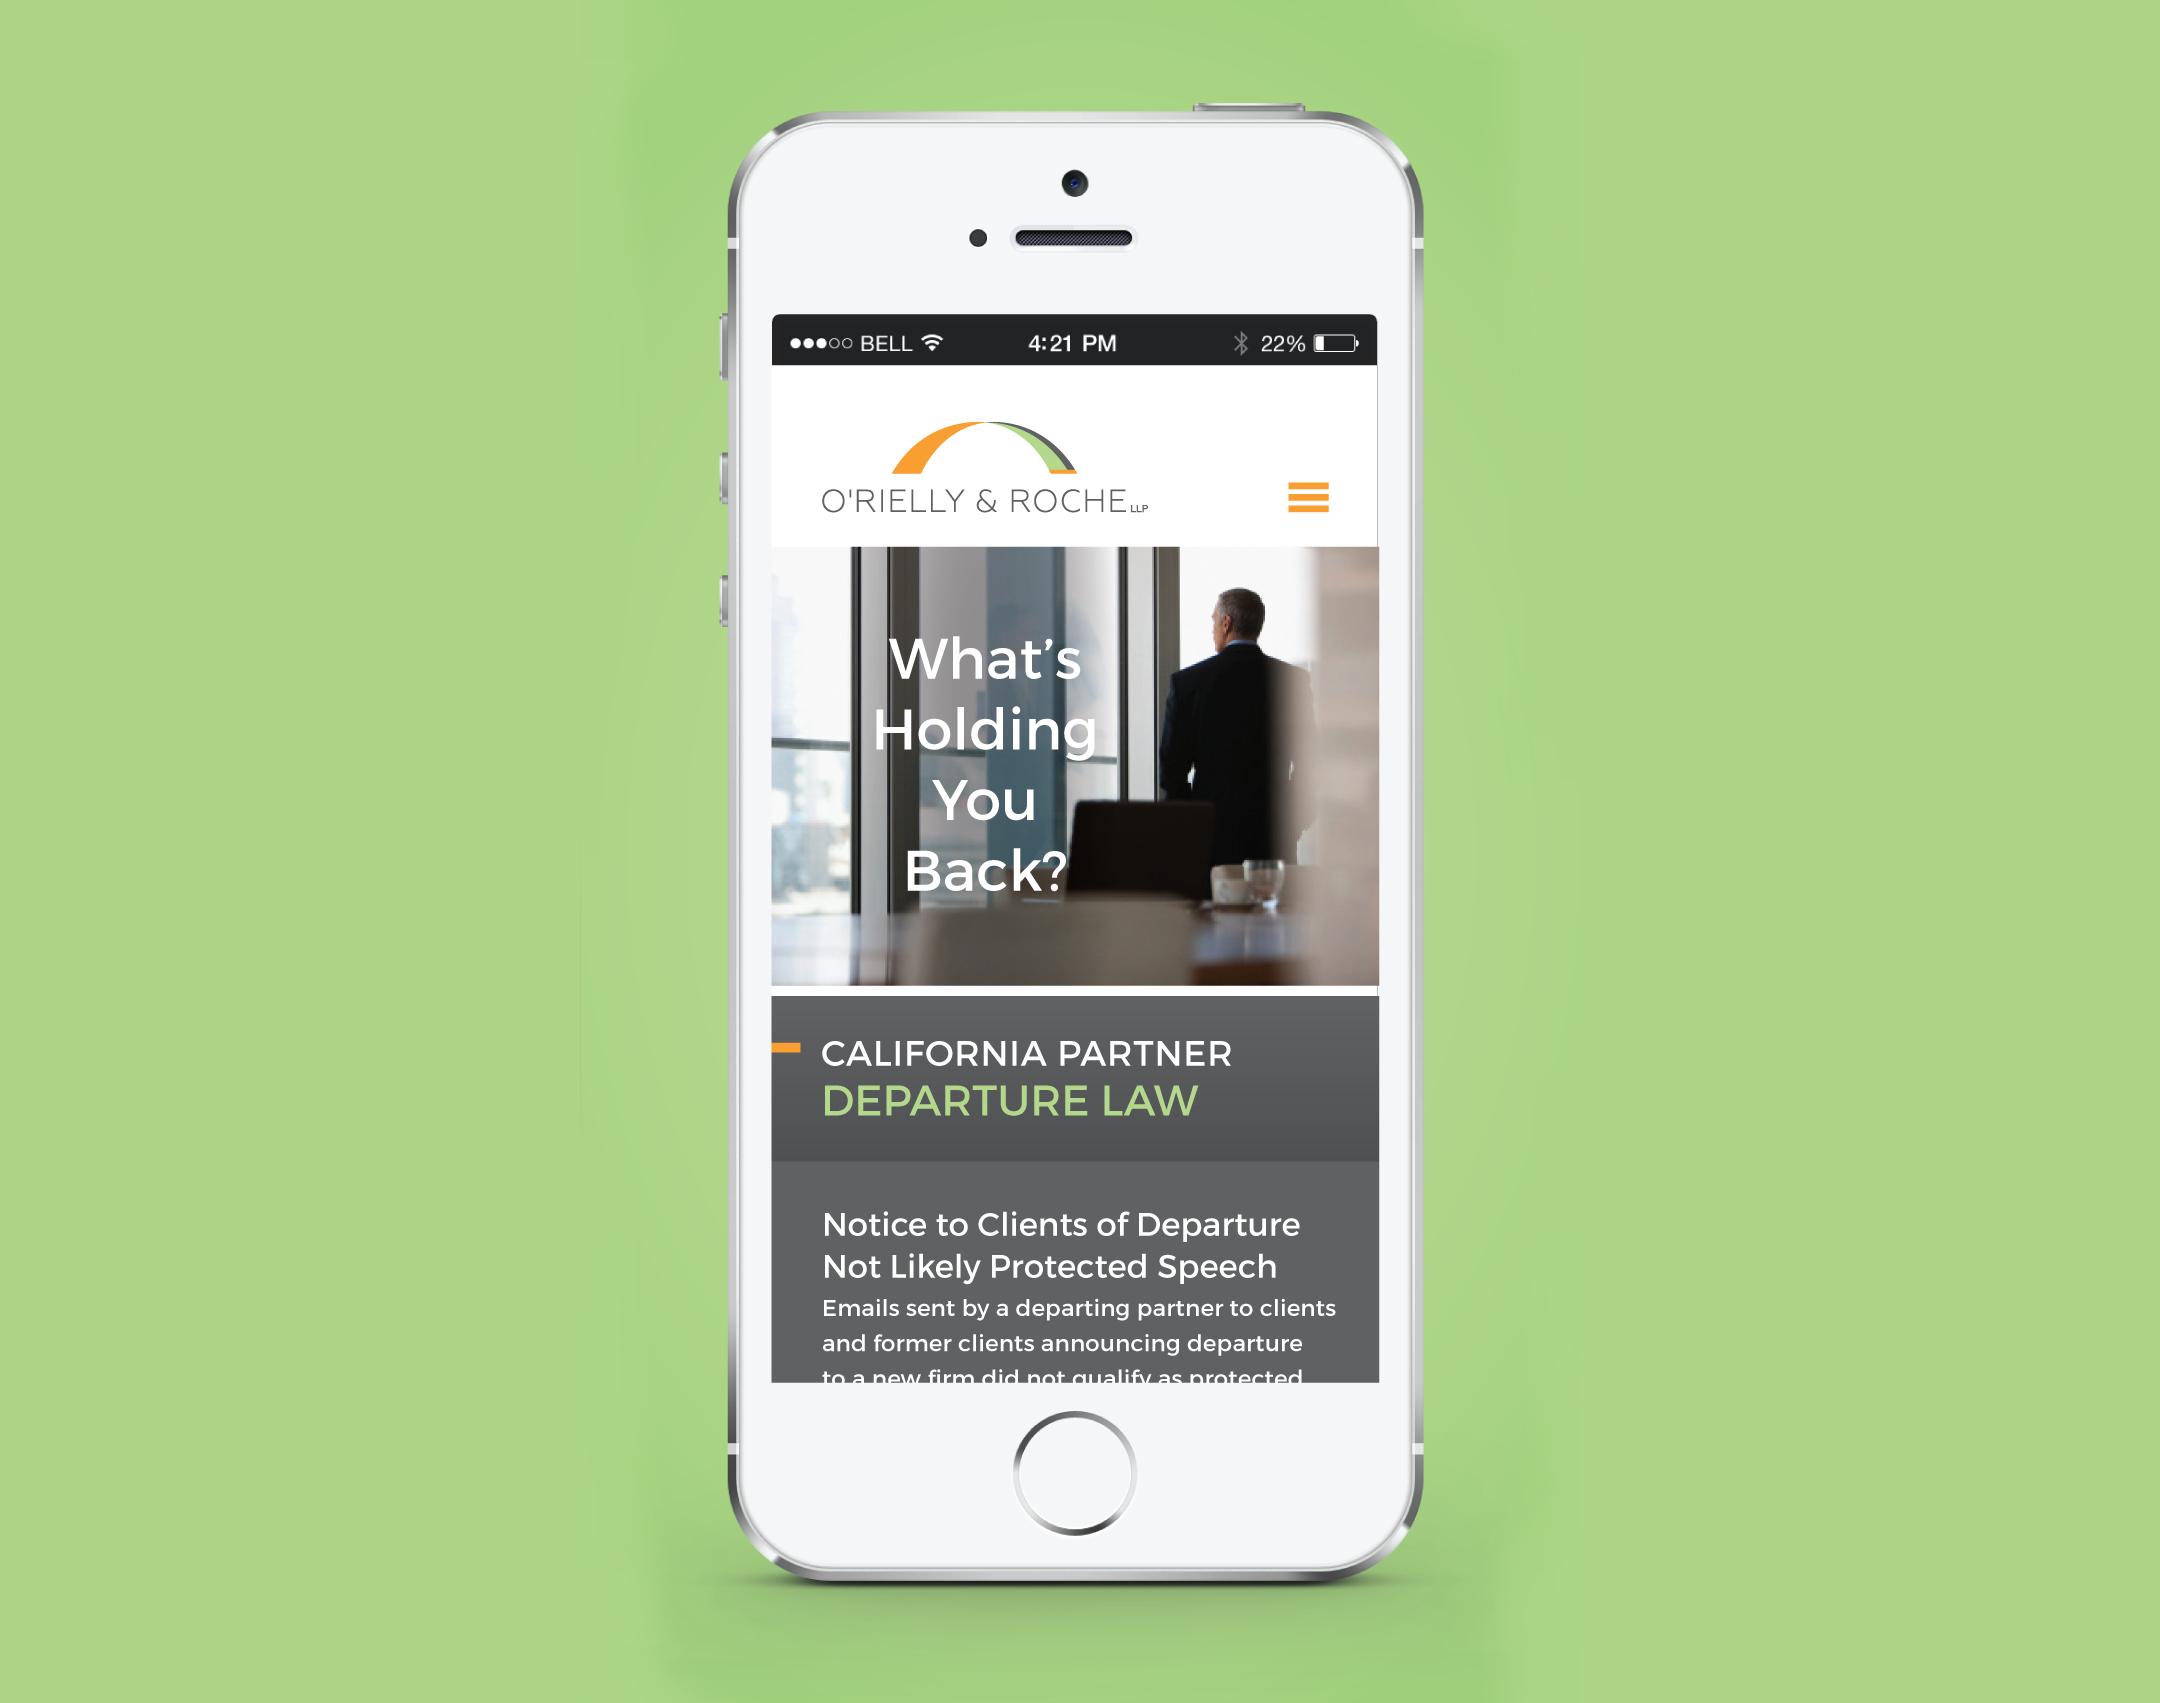 Law Firm Website Design - O'Rielly & Roche - Mobile